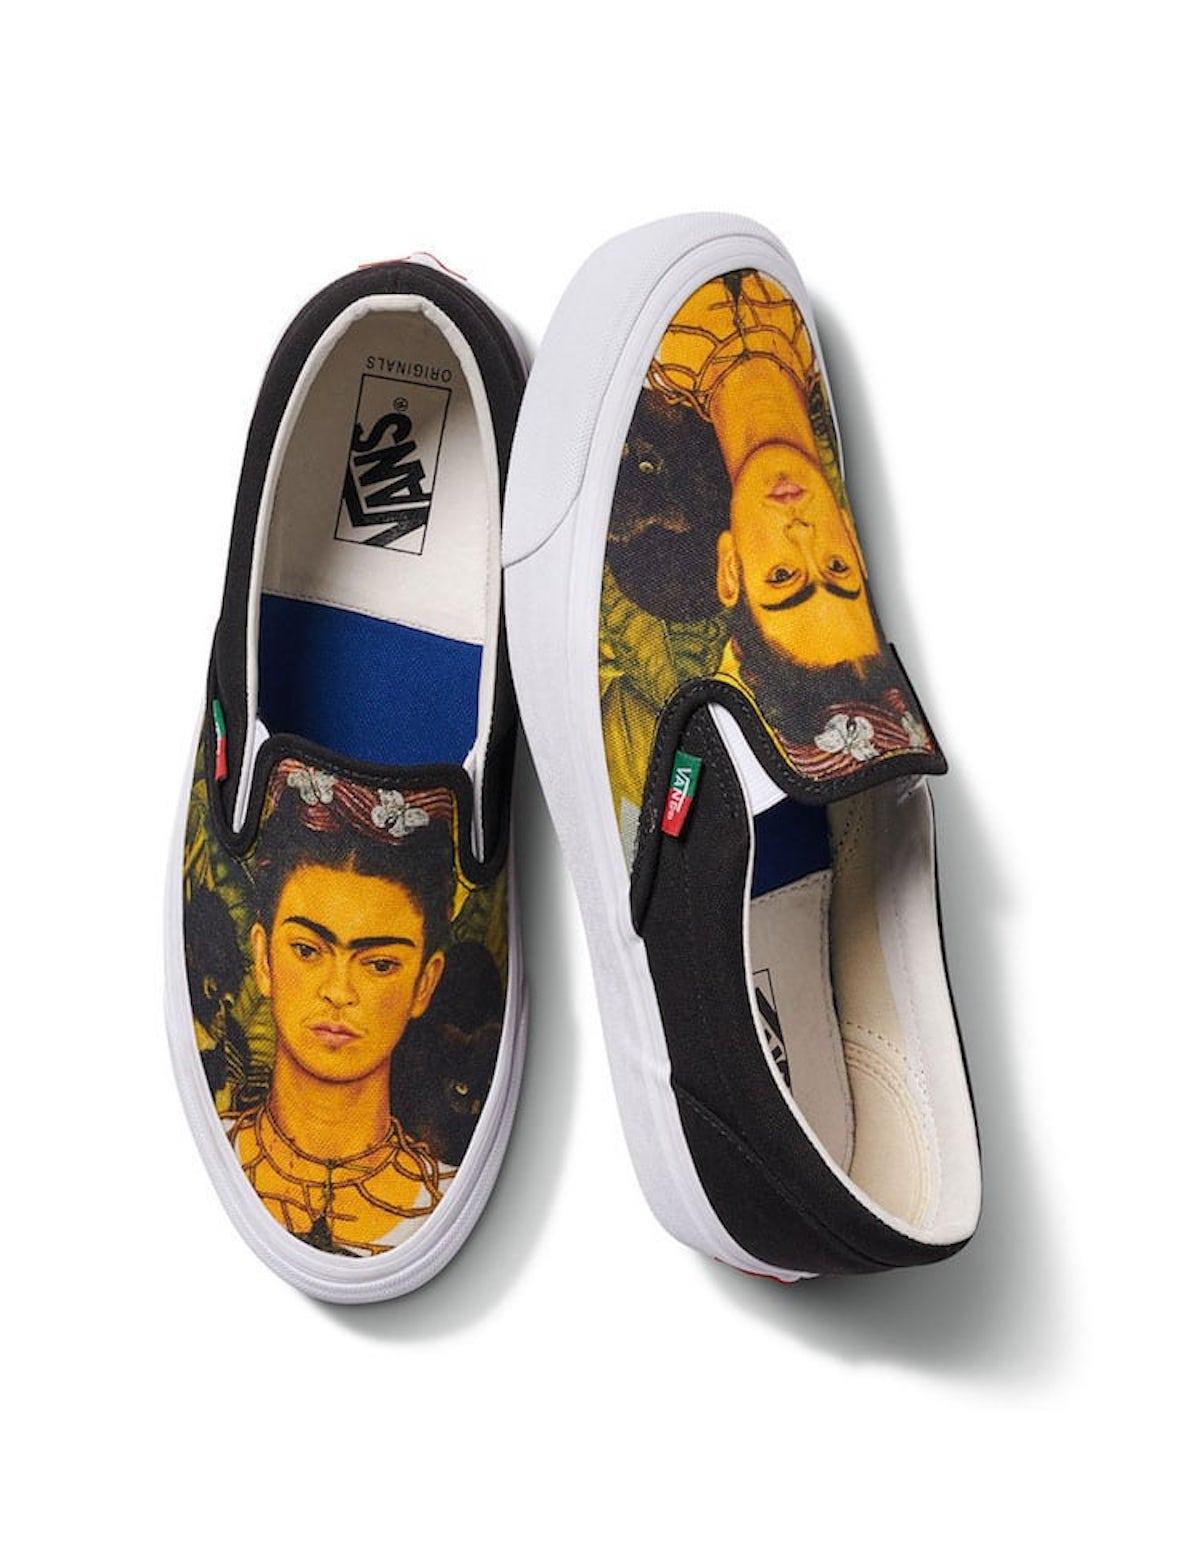 Vans Frida Kahlo musée Van Gogh